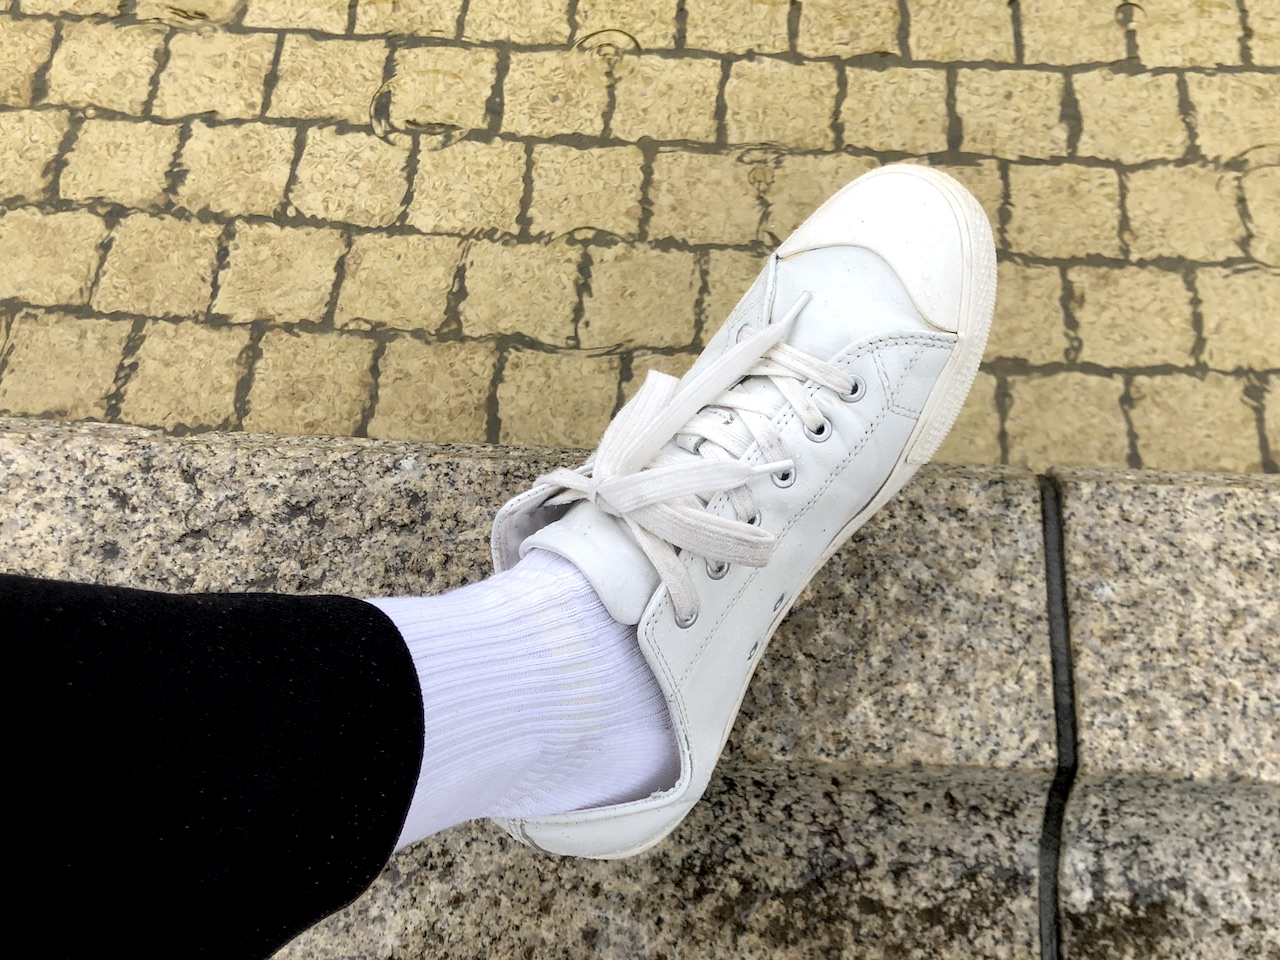 adidasハイソックスとツンツルテンパンツと雨…|白ソックス系男子